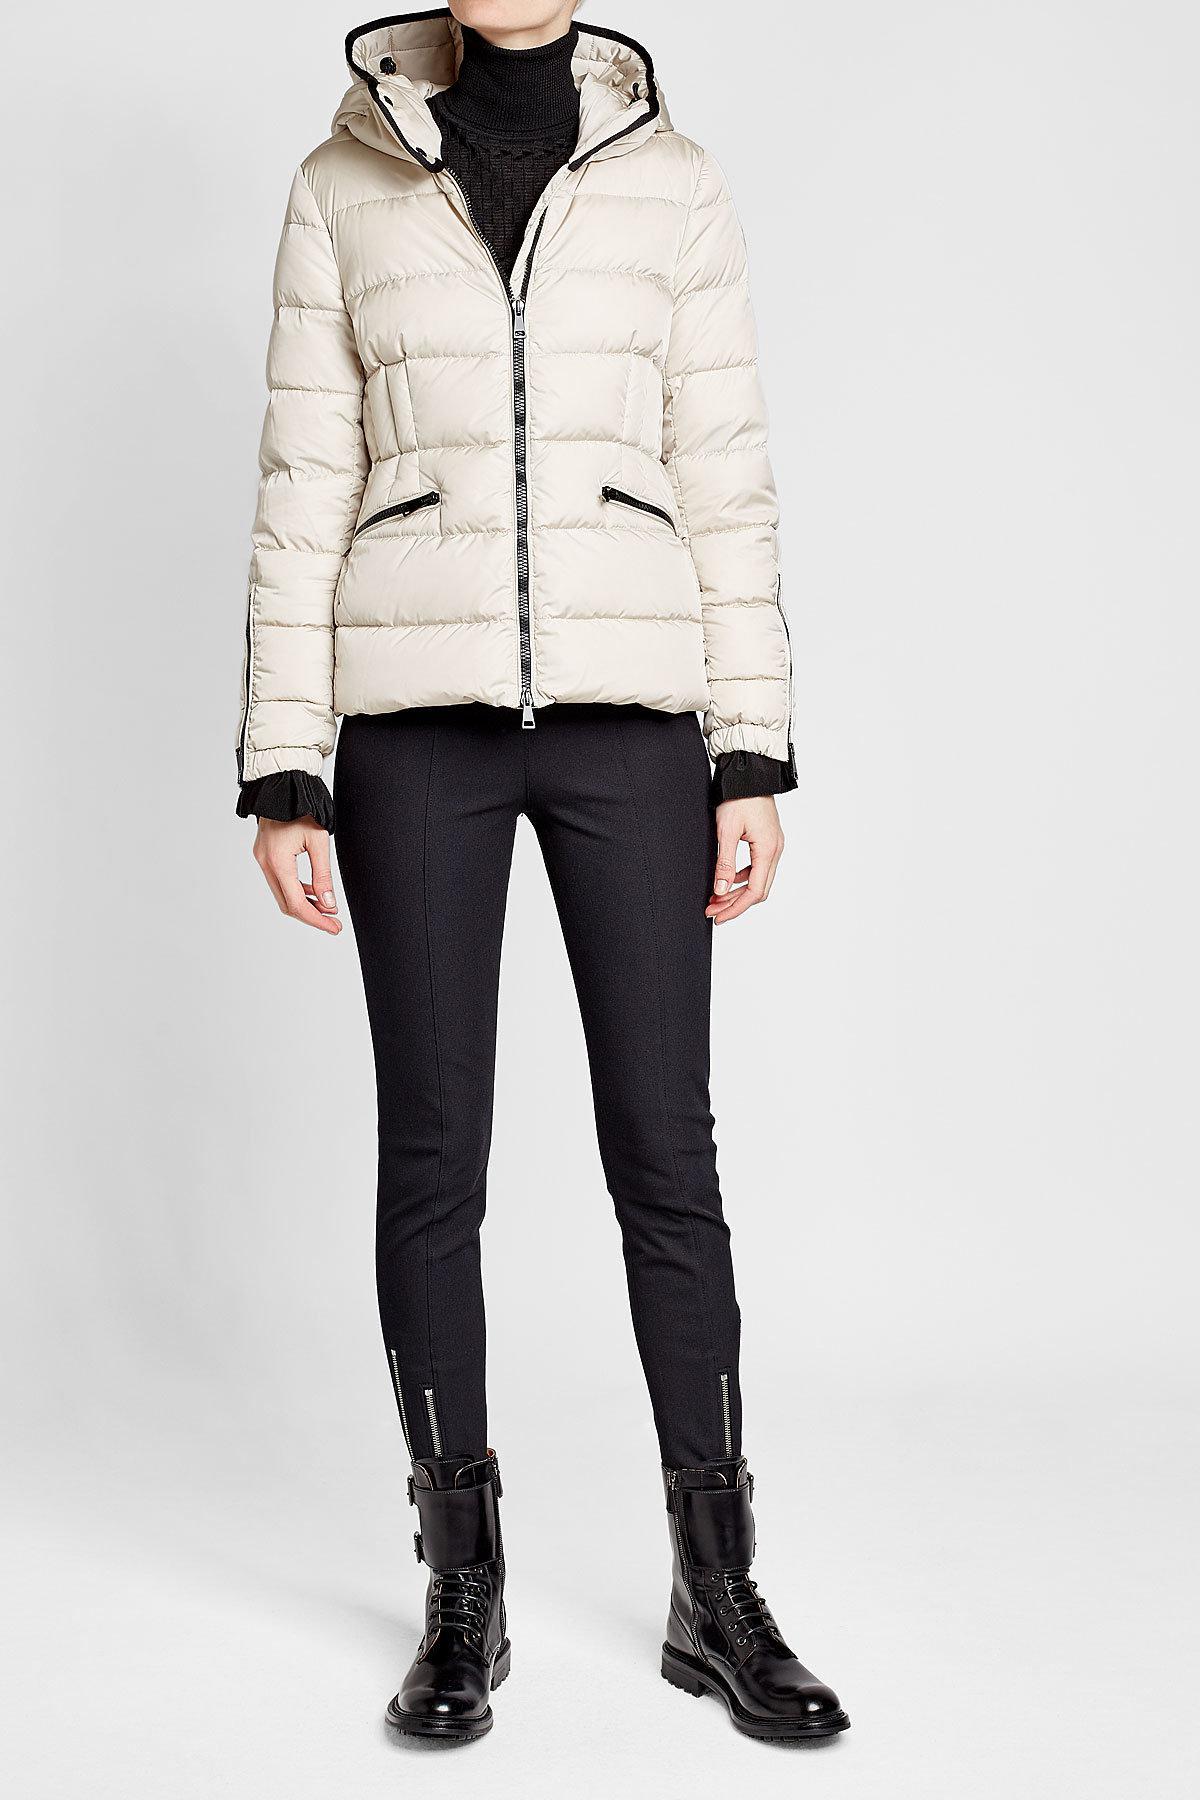 North Face Tonnerro Jacket